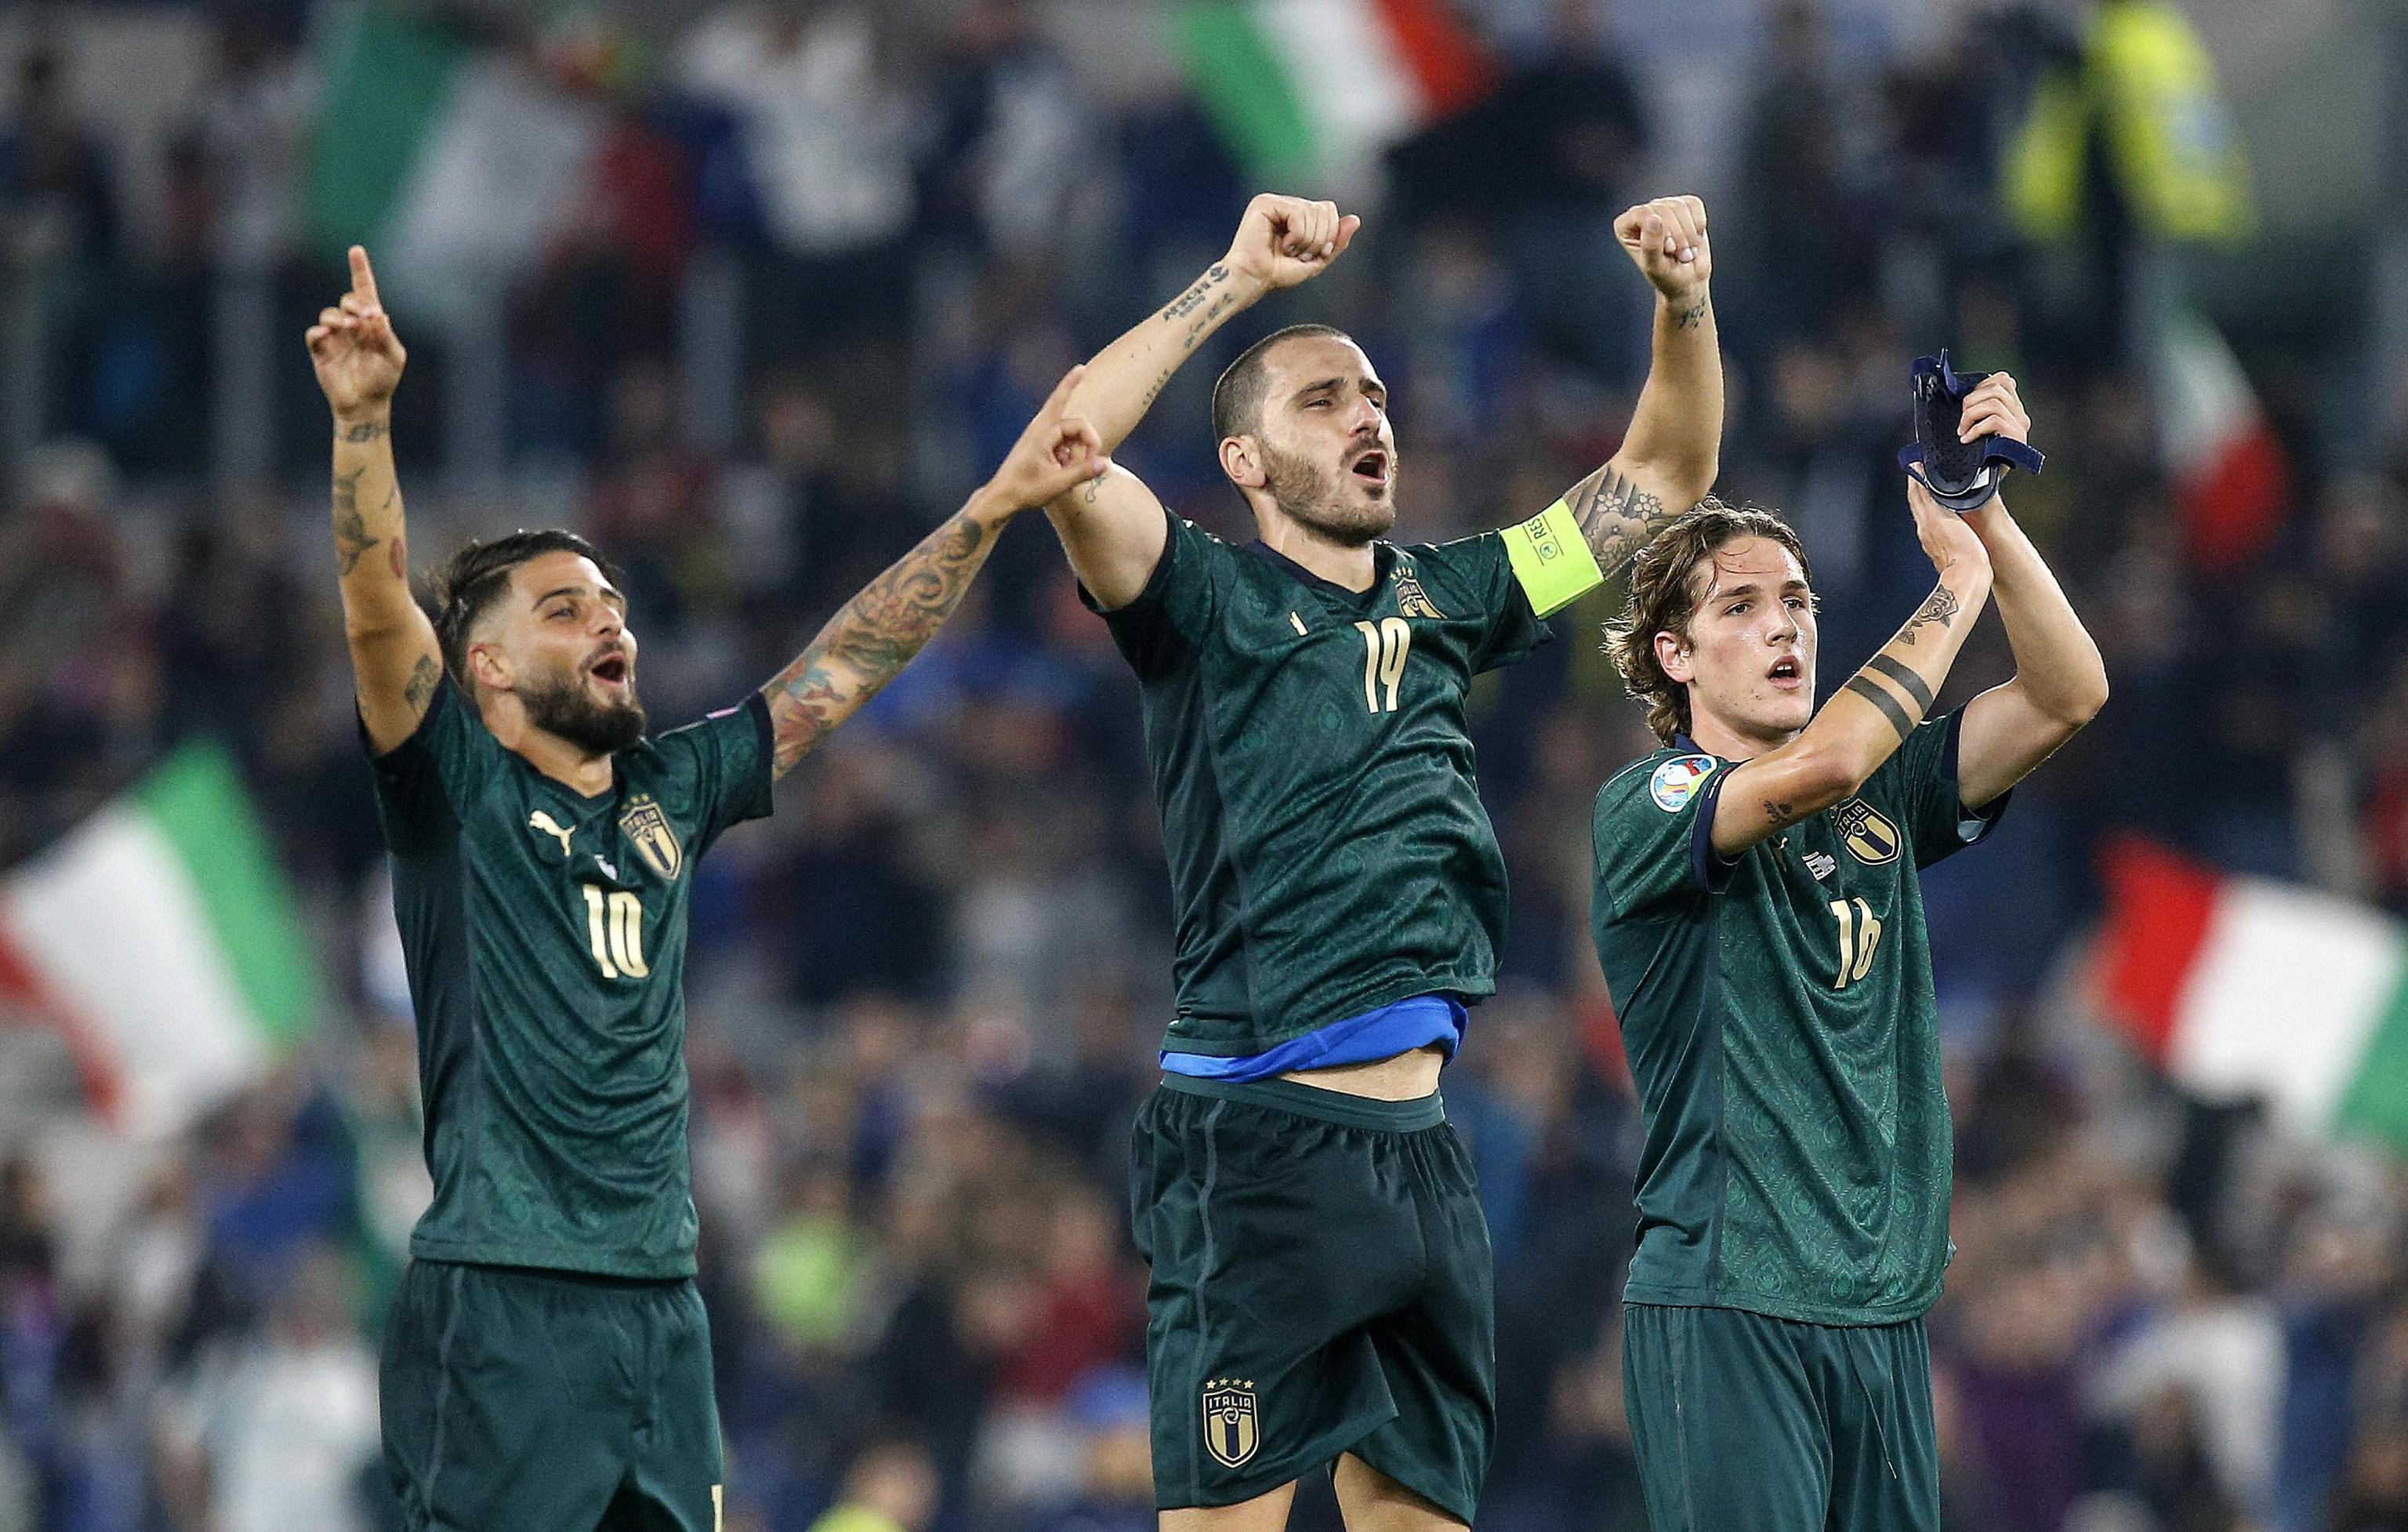 Italia tendrá varias ausencias ante Bosnia y Armenia Italia, ya clasificada para la Eurocopa 2020, juega - Esto